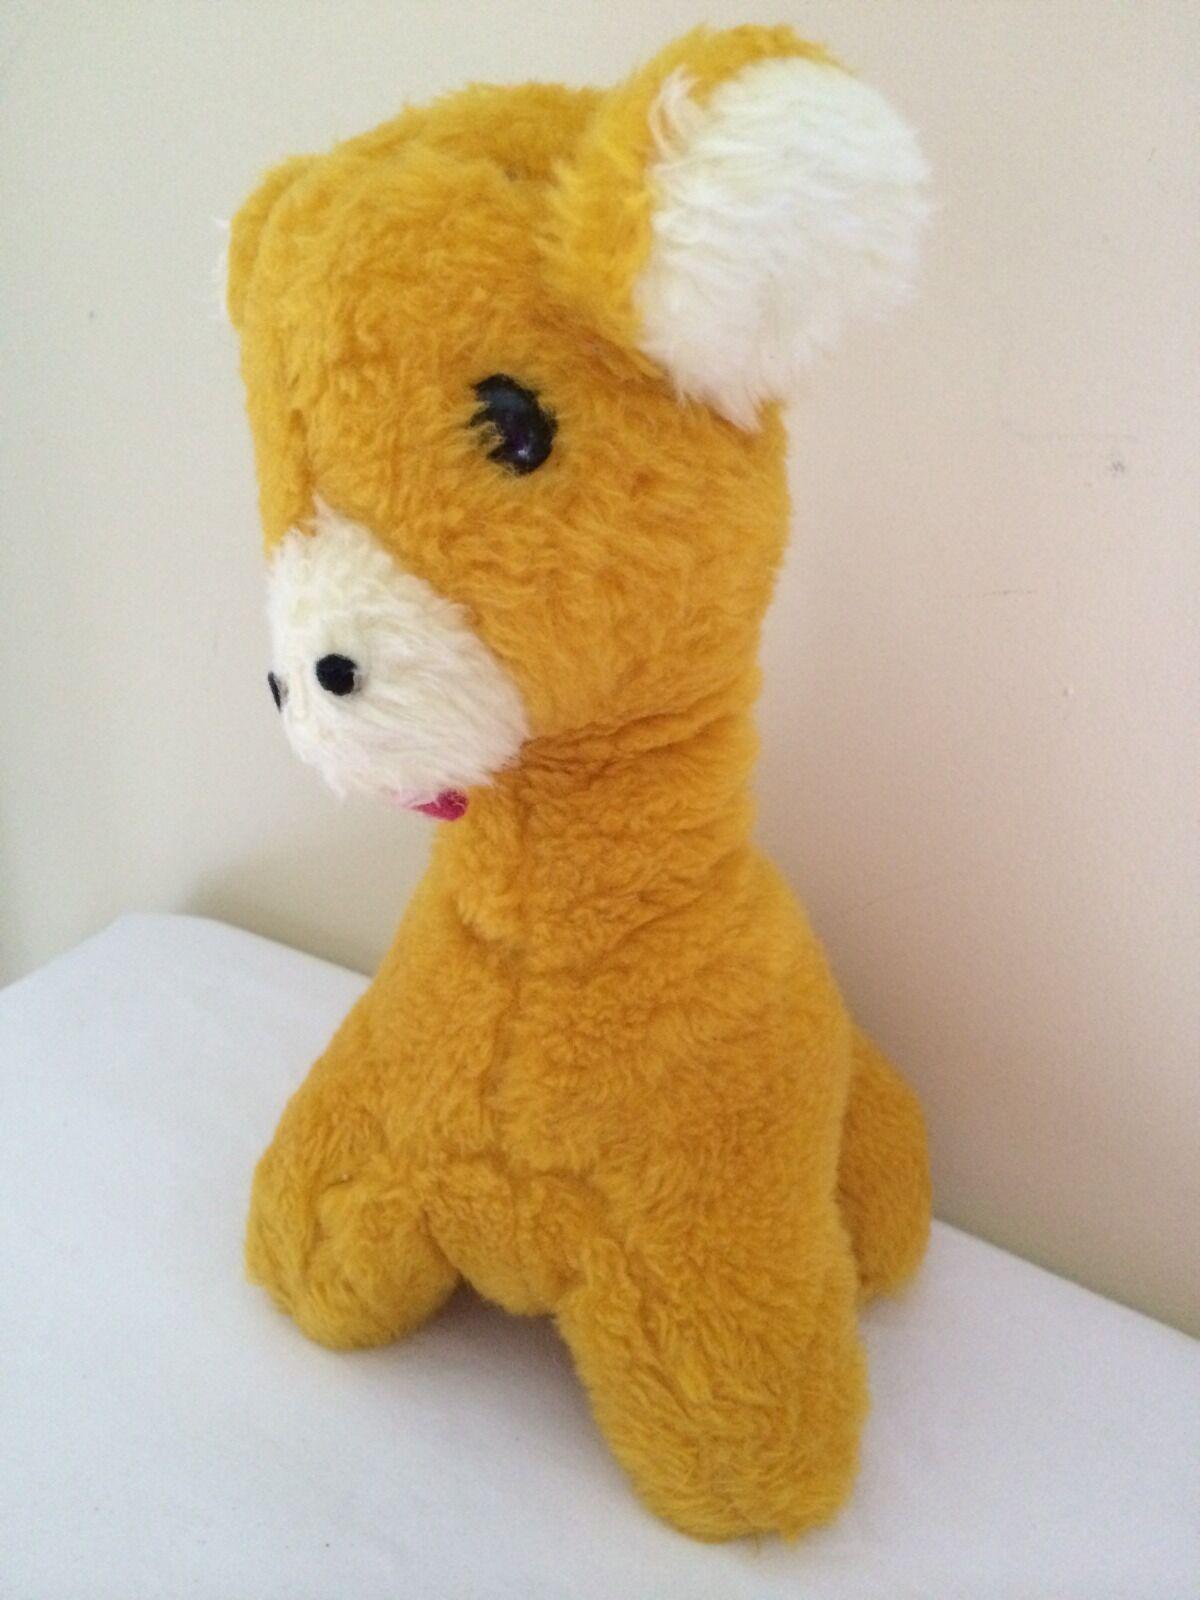 Vintage 1976 Animal Fair Inc. Giraffe Rattle Orange Stuffed Animal Toy 12